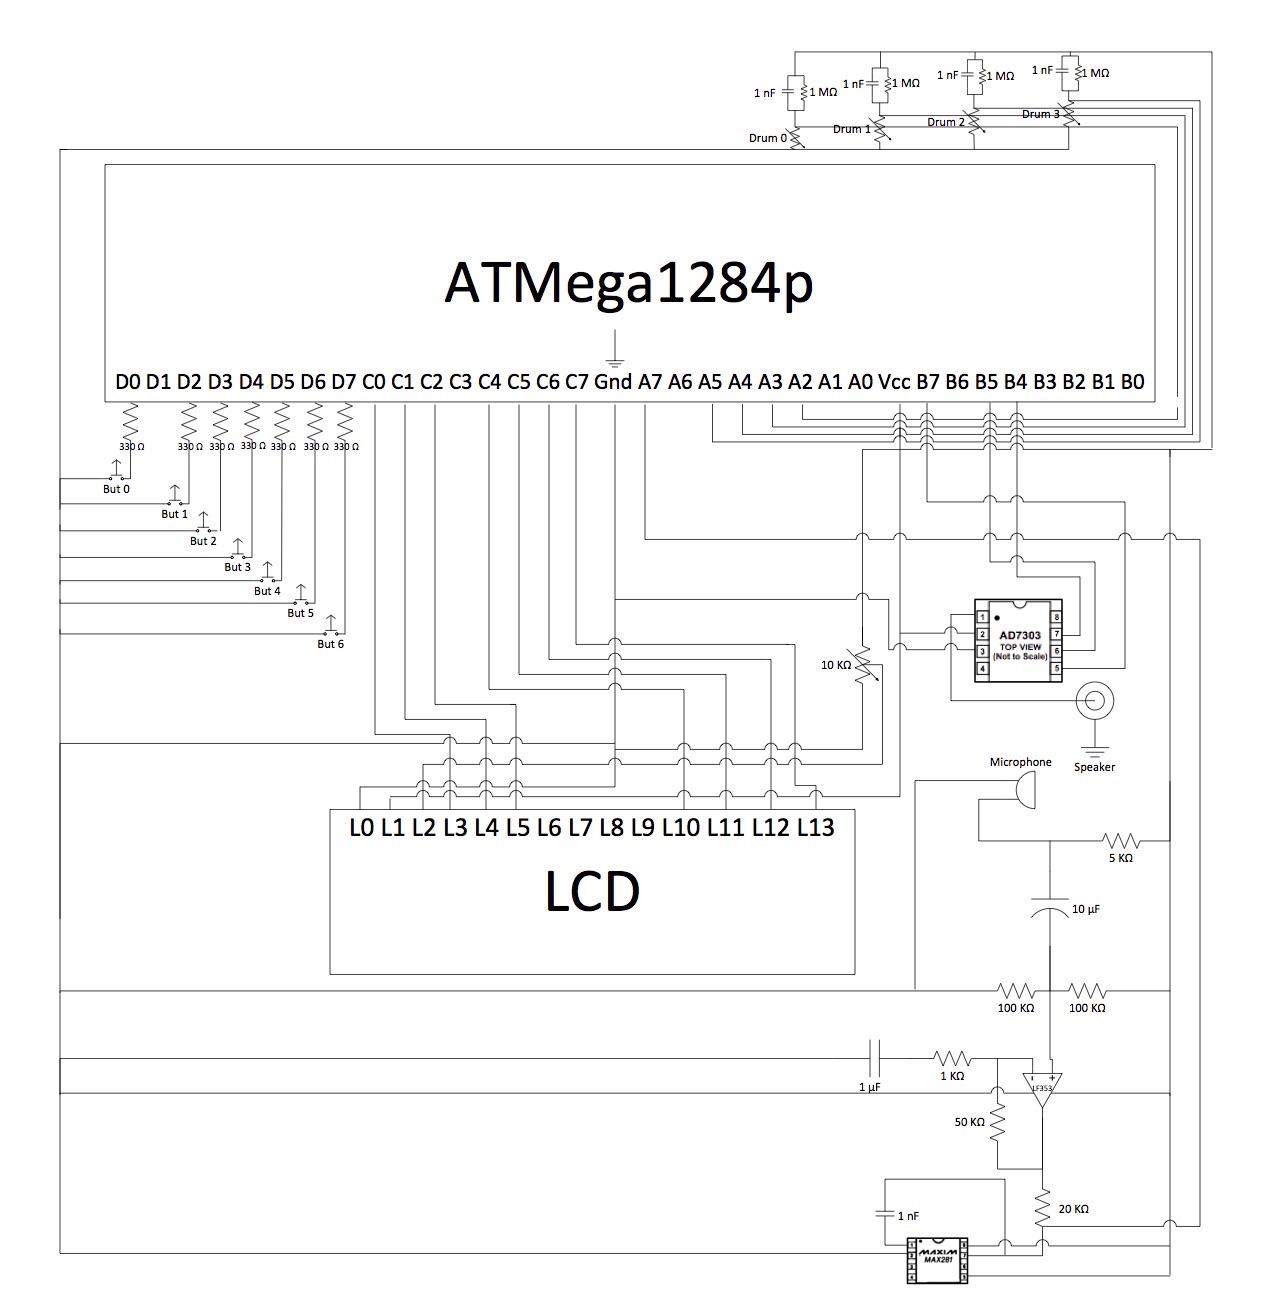 Electronic Drum Set Schematic Diagram Schematics Wiring Diagrams Simple Block Circuit And